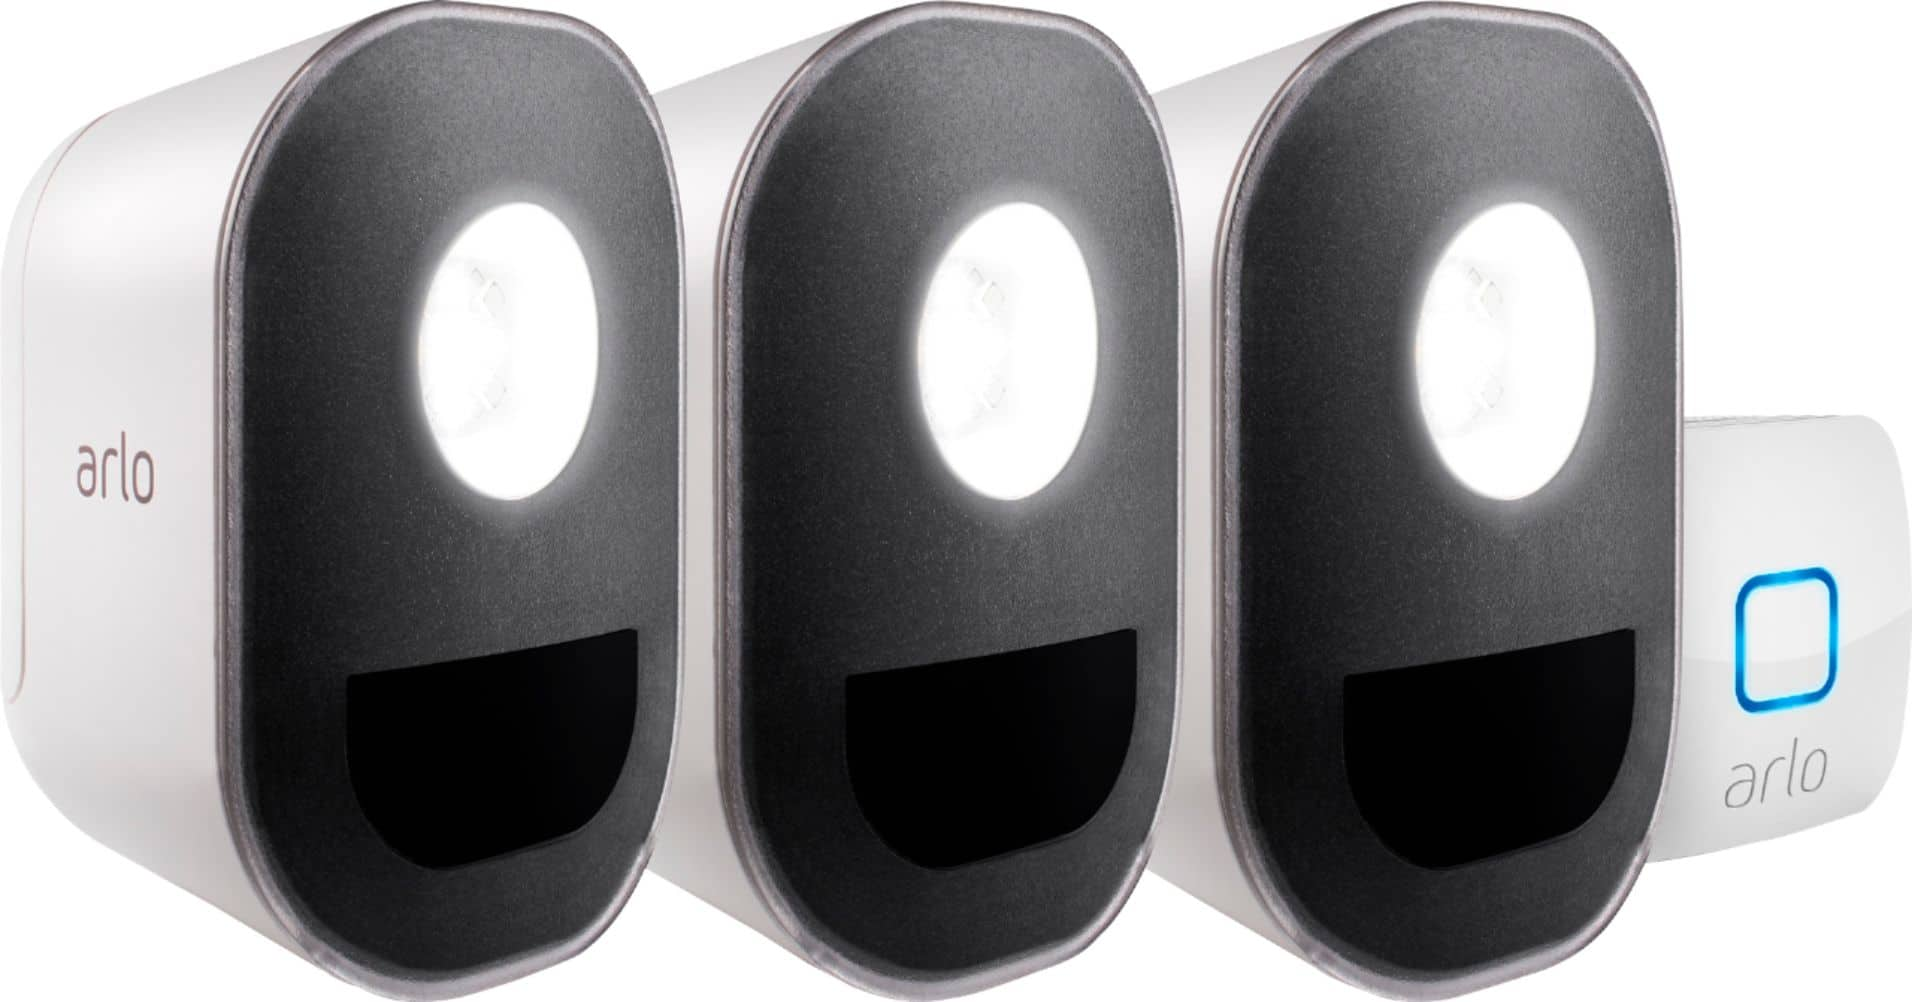 Arlo Battery-Powered LED Security Light Black/White ALS1103-100NAS - Best Buy $120